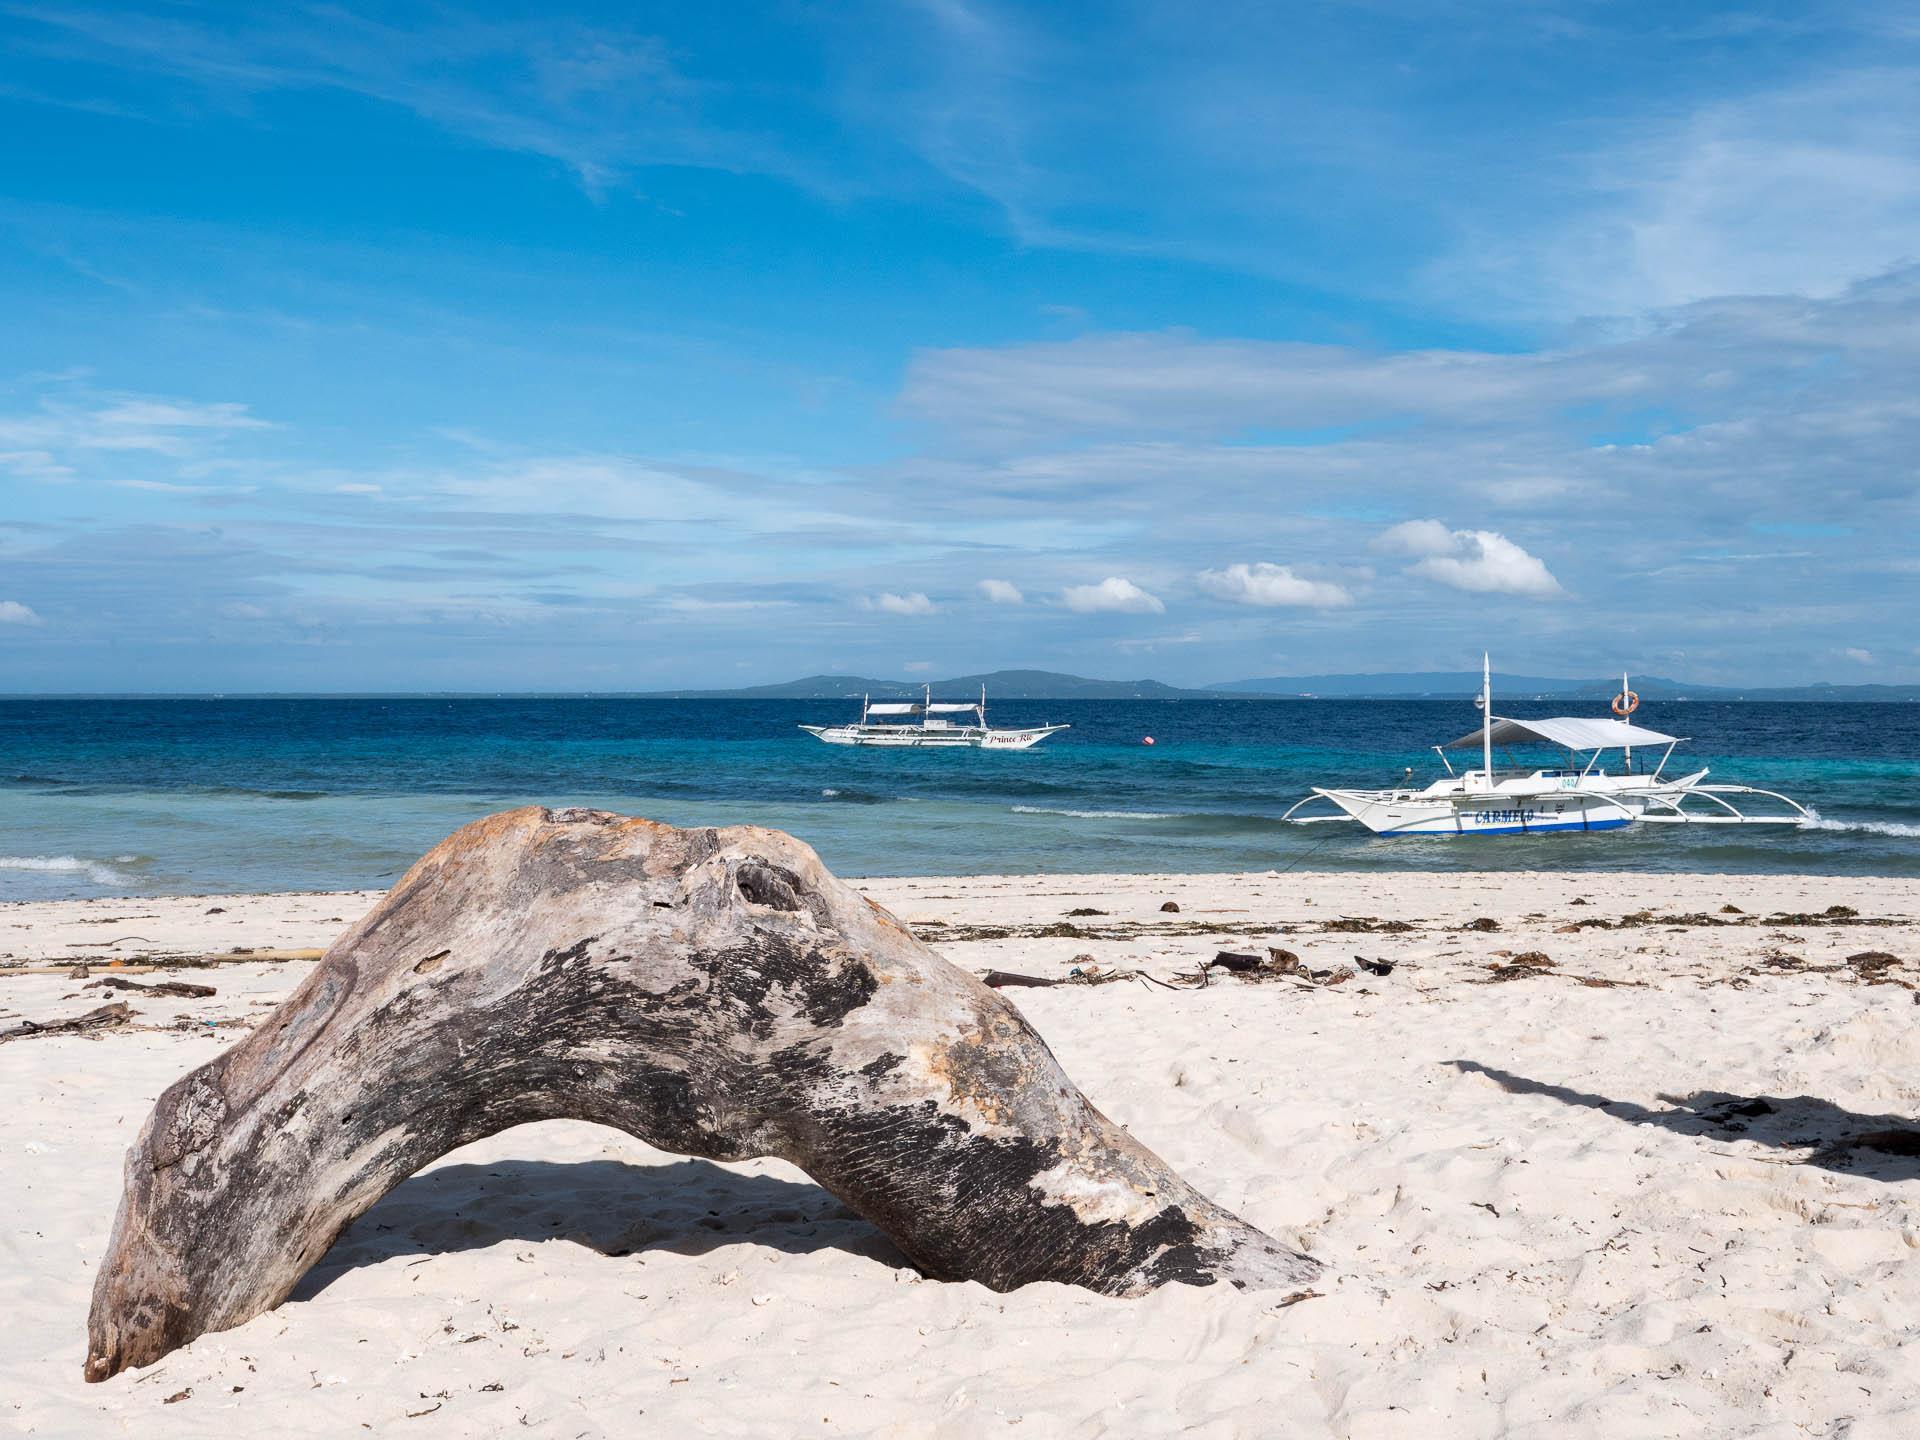 Pamilacan plage - Les globe blogueurs - blog voyage nature